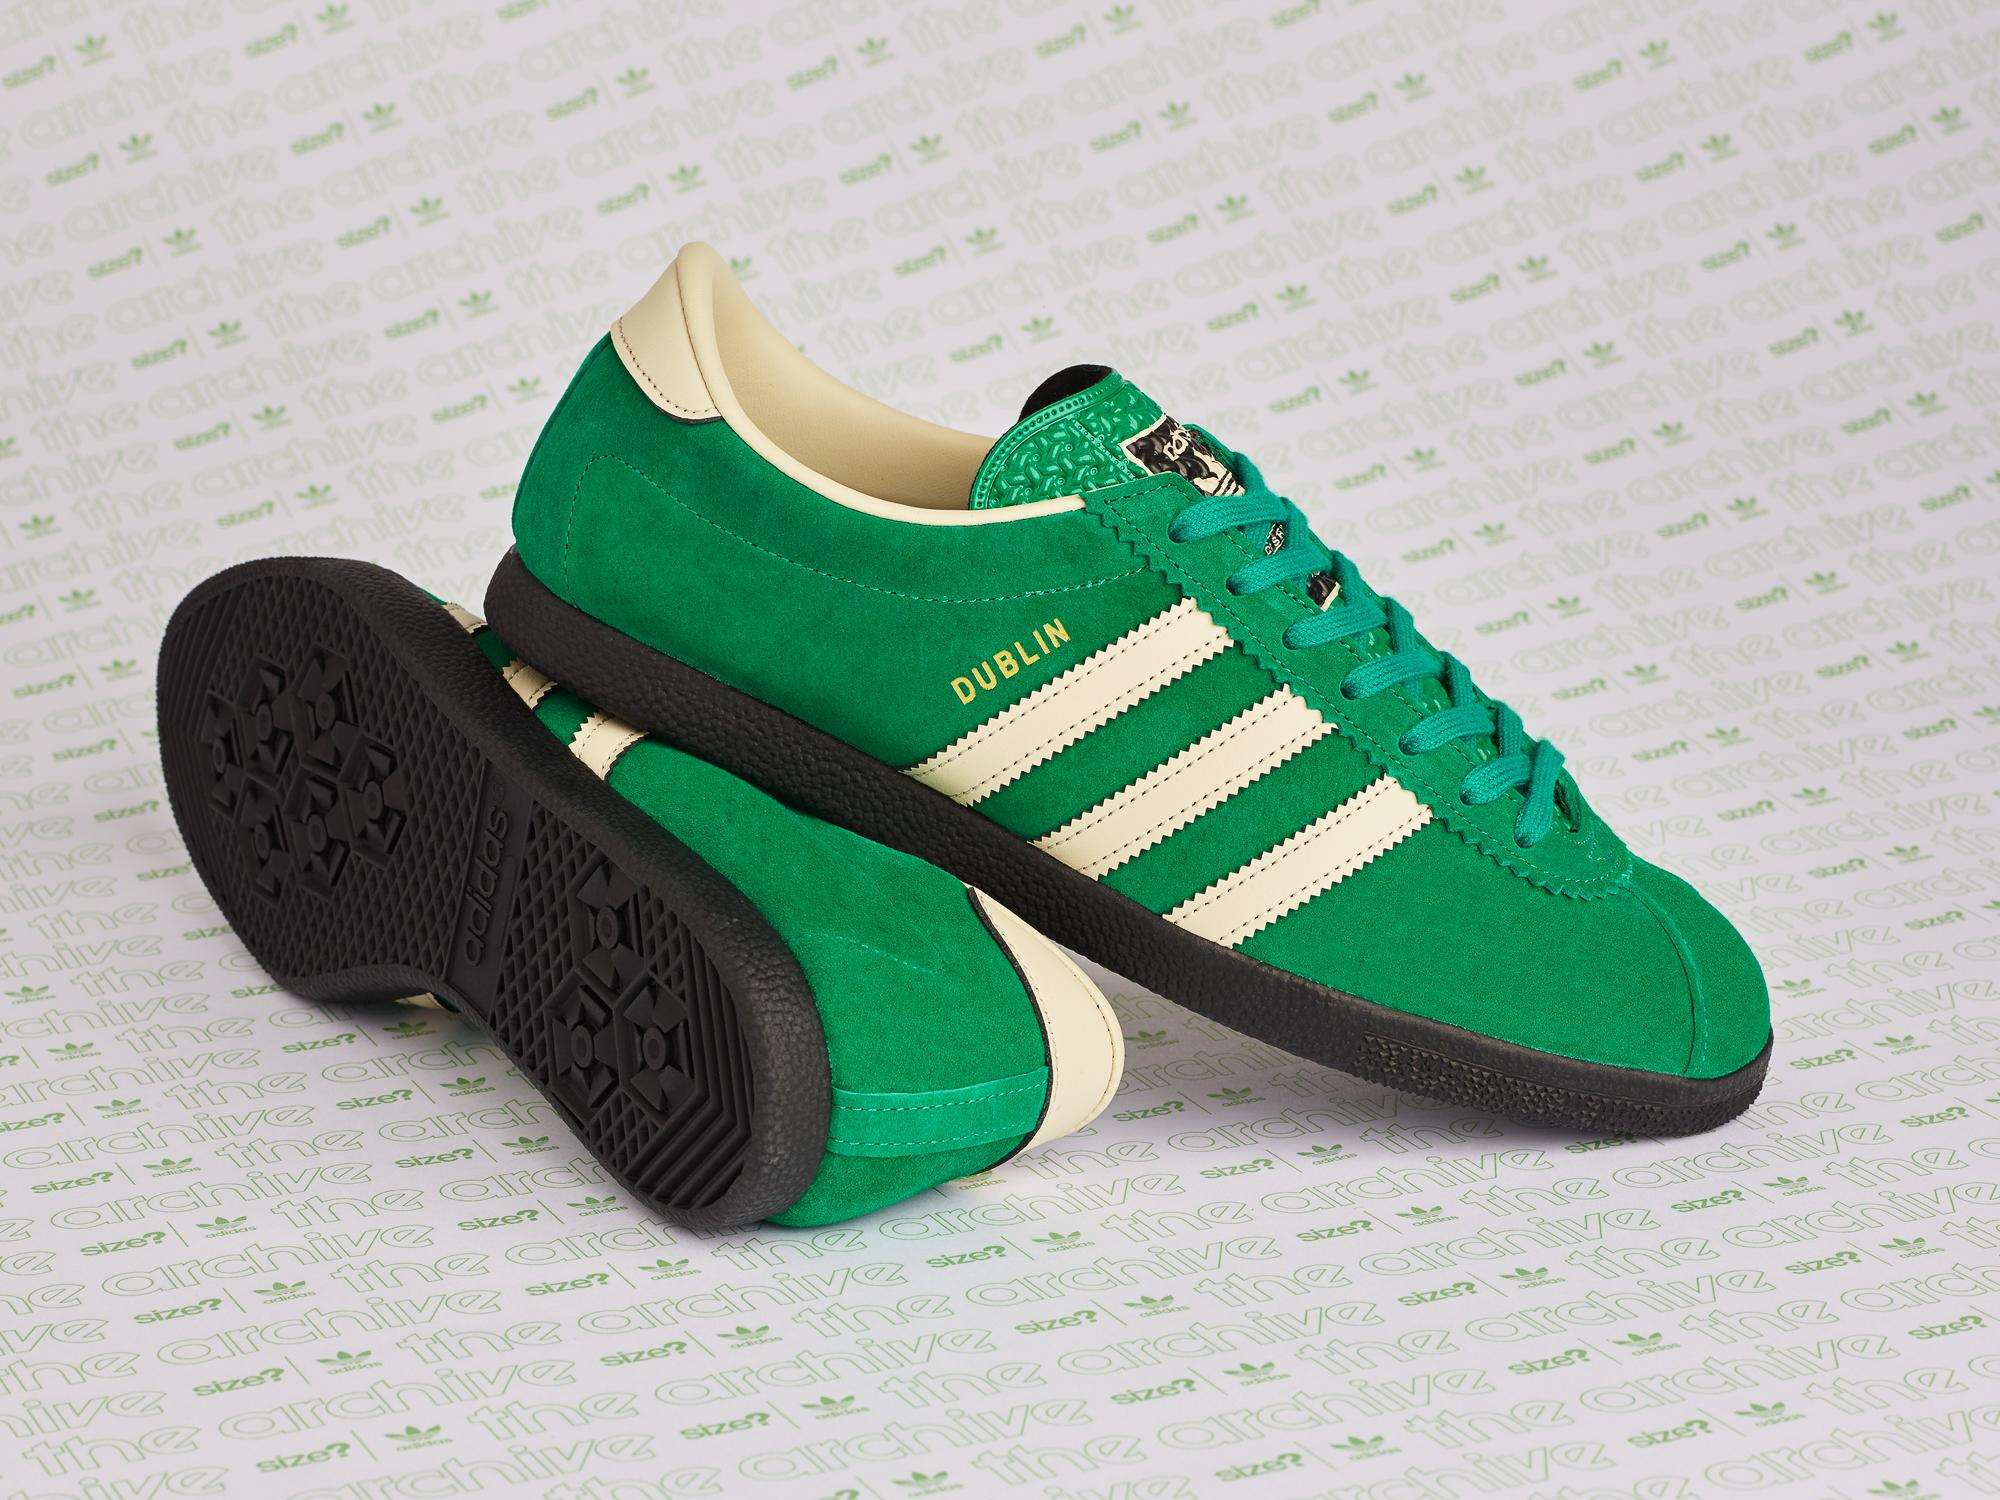 adidas Originals Archive Dublin St Patrick's Day size 2